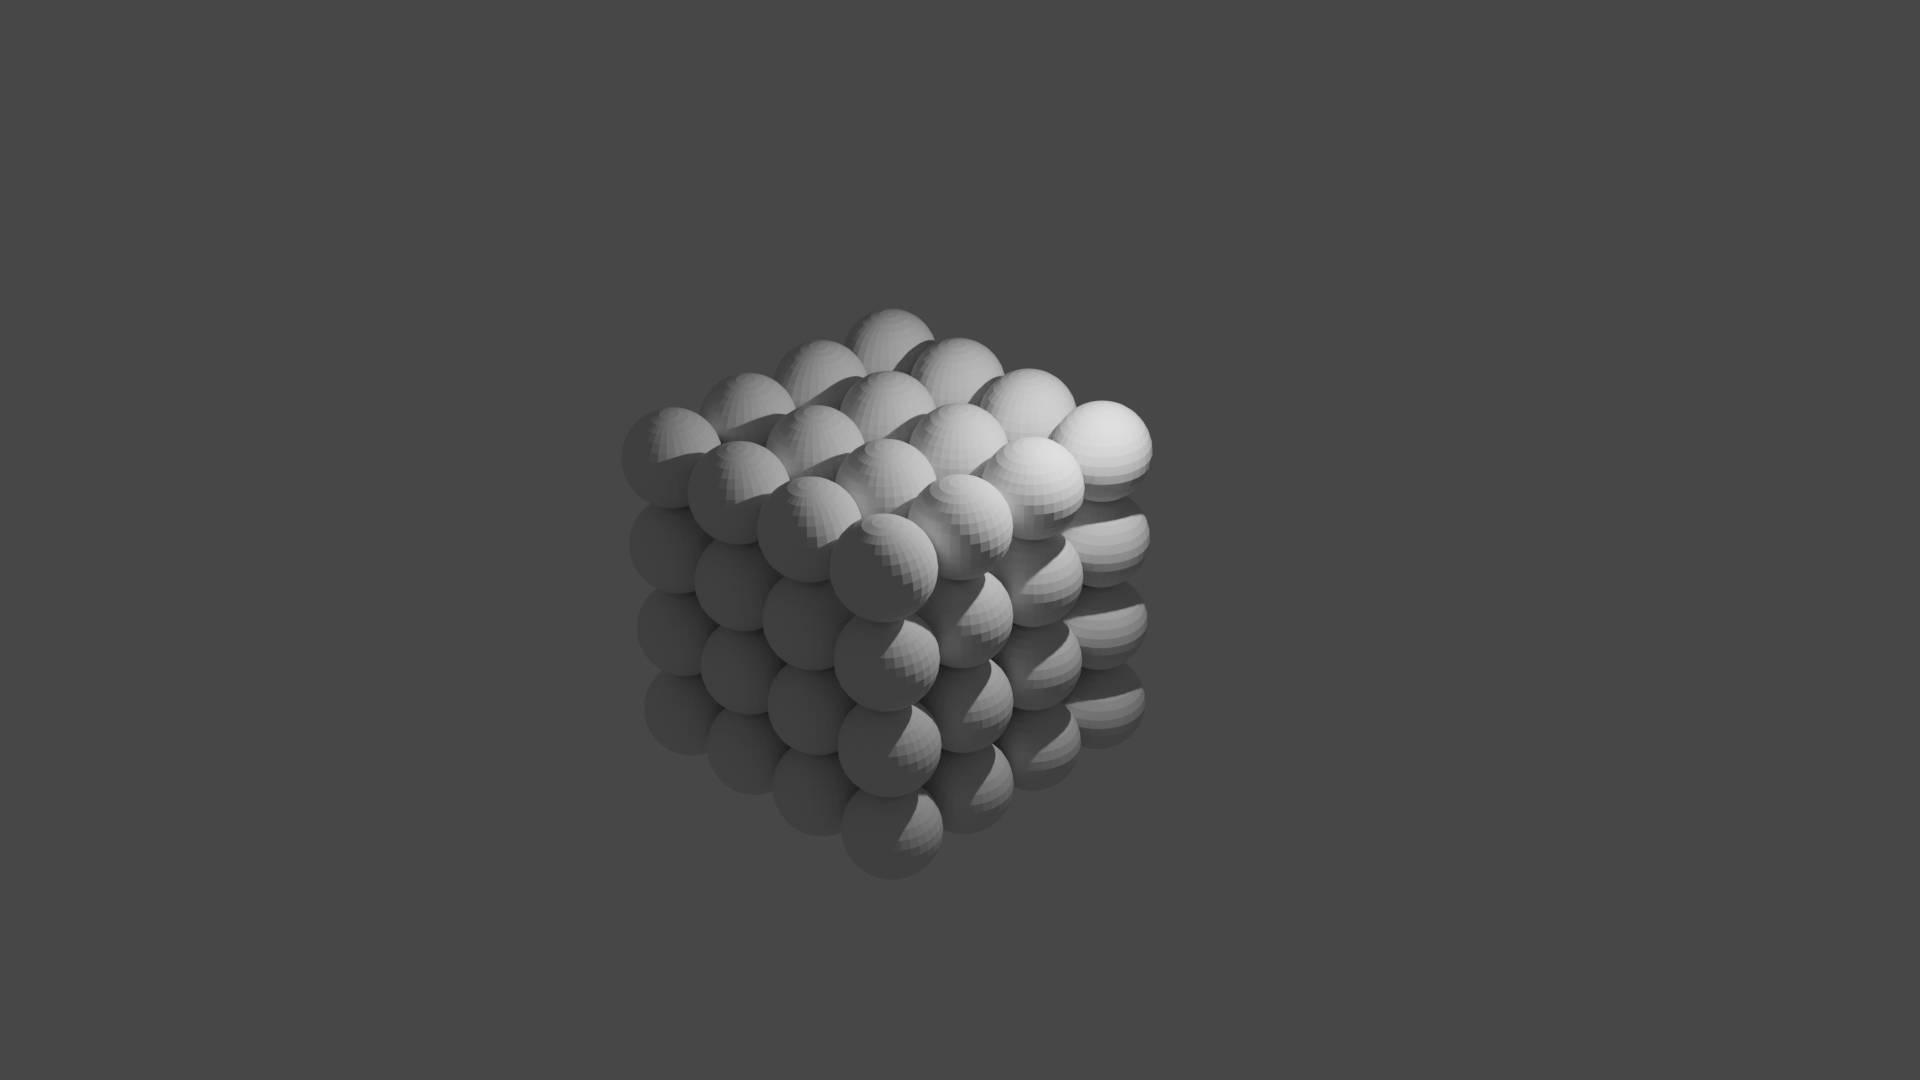 uv_sphere.pyで作ったもの